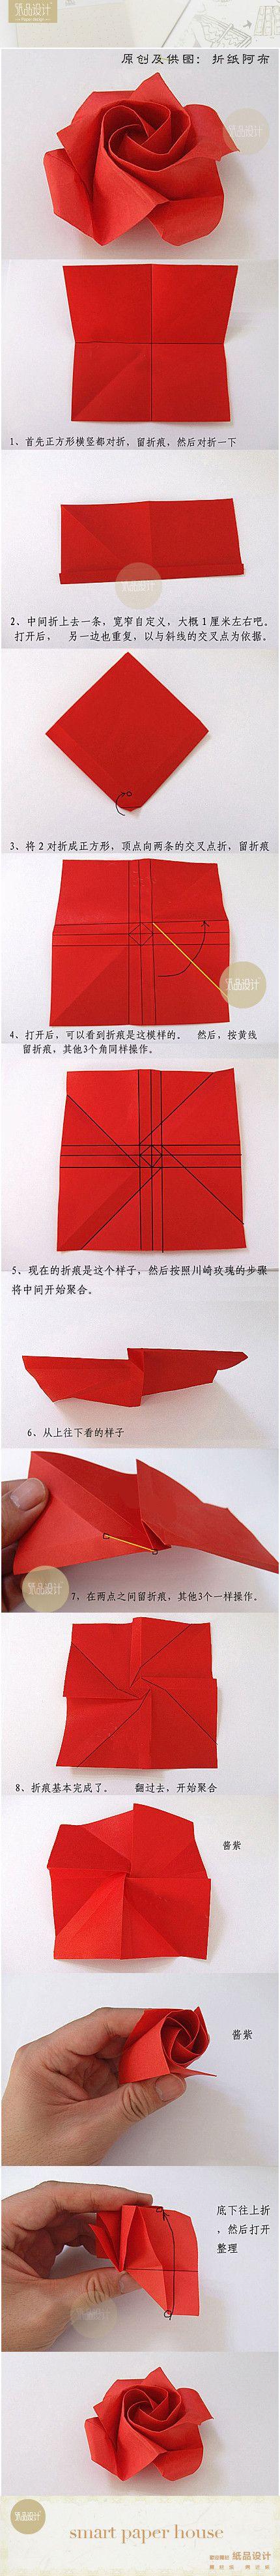 Origami Rose #papiroflexia